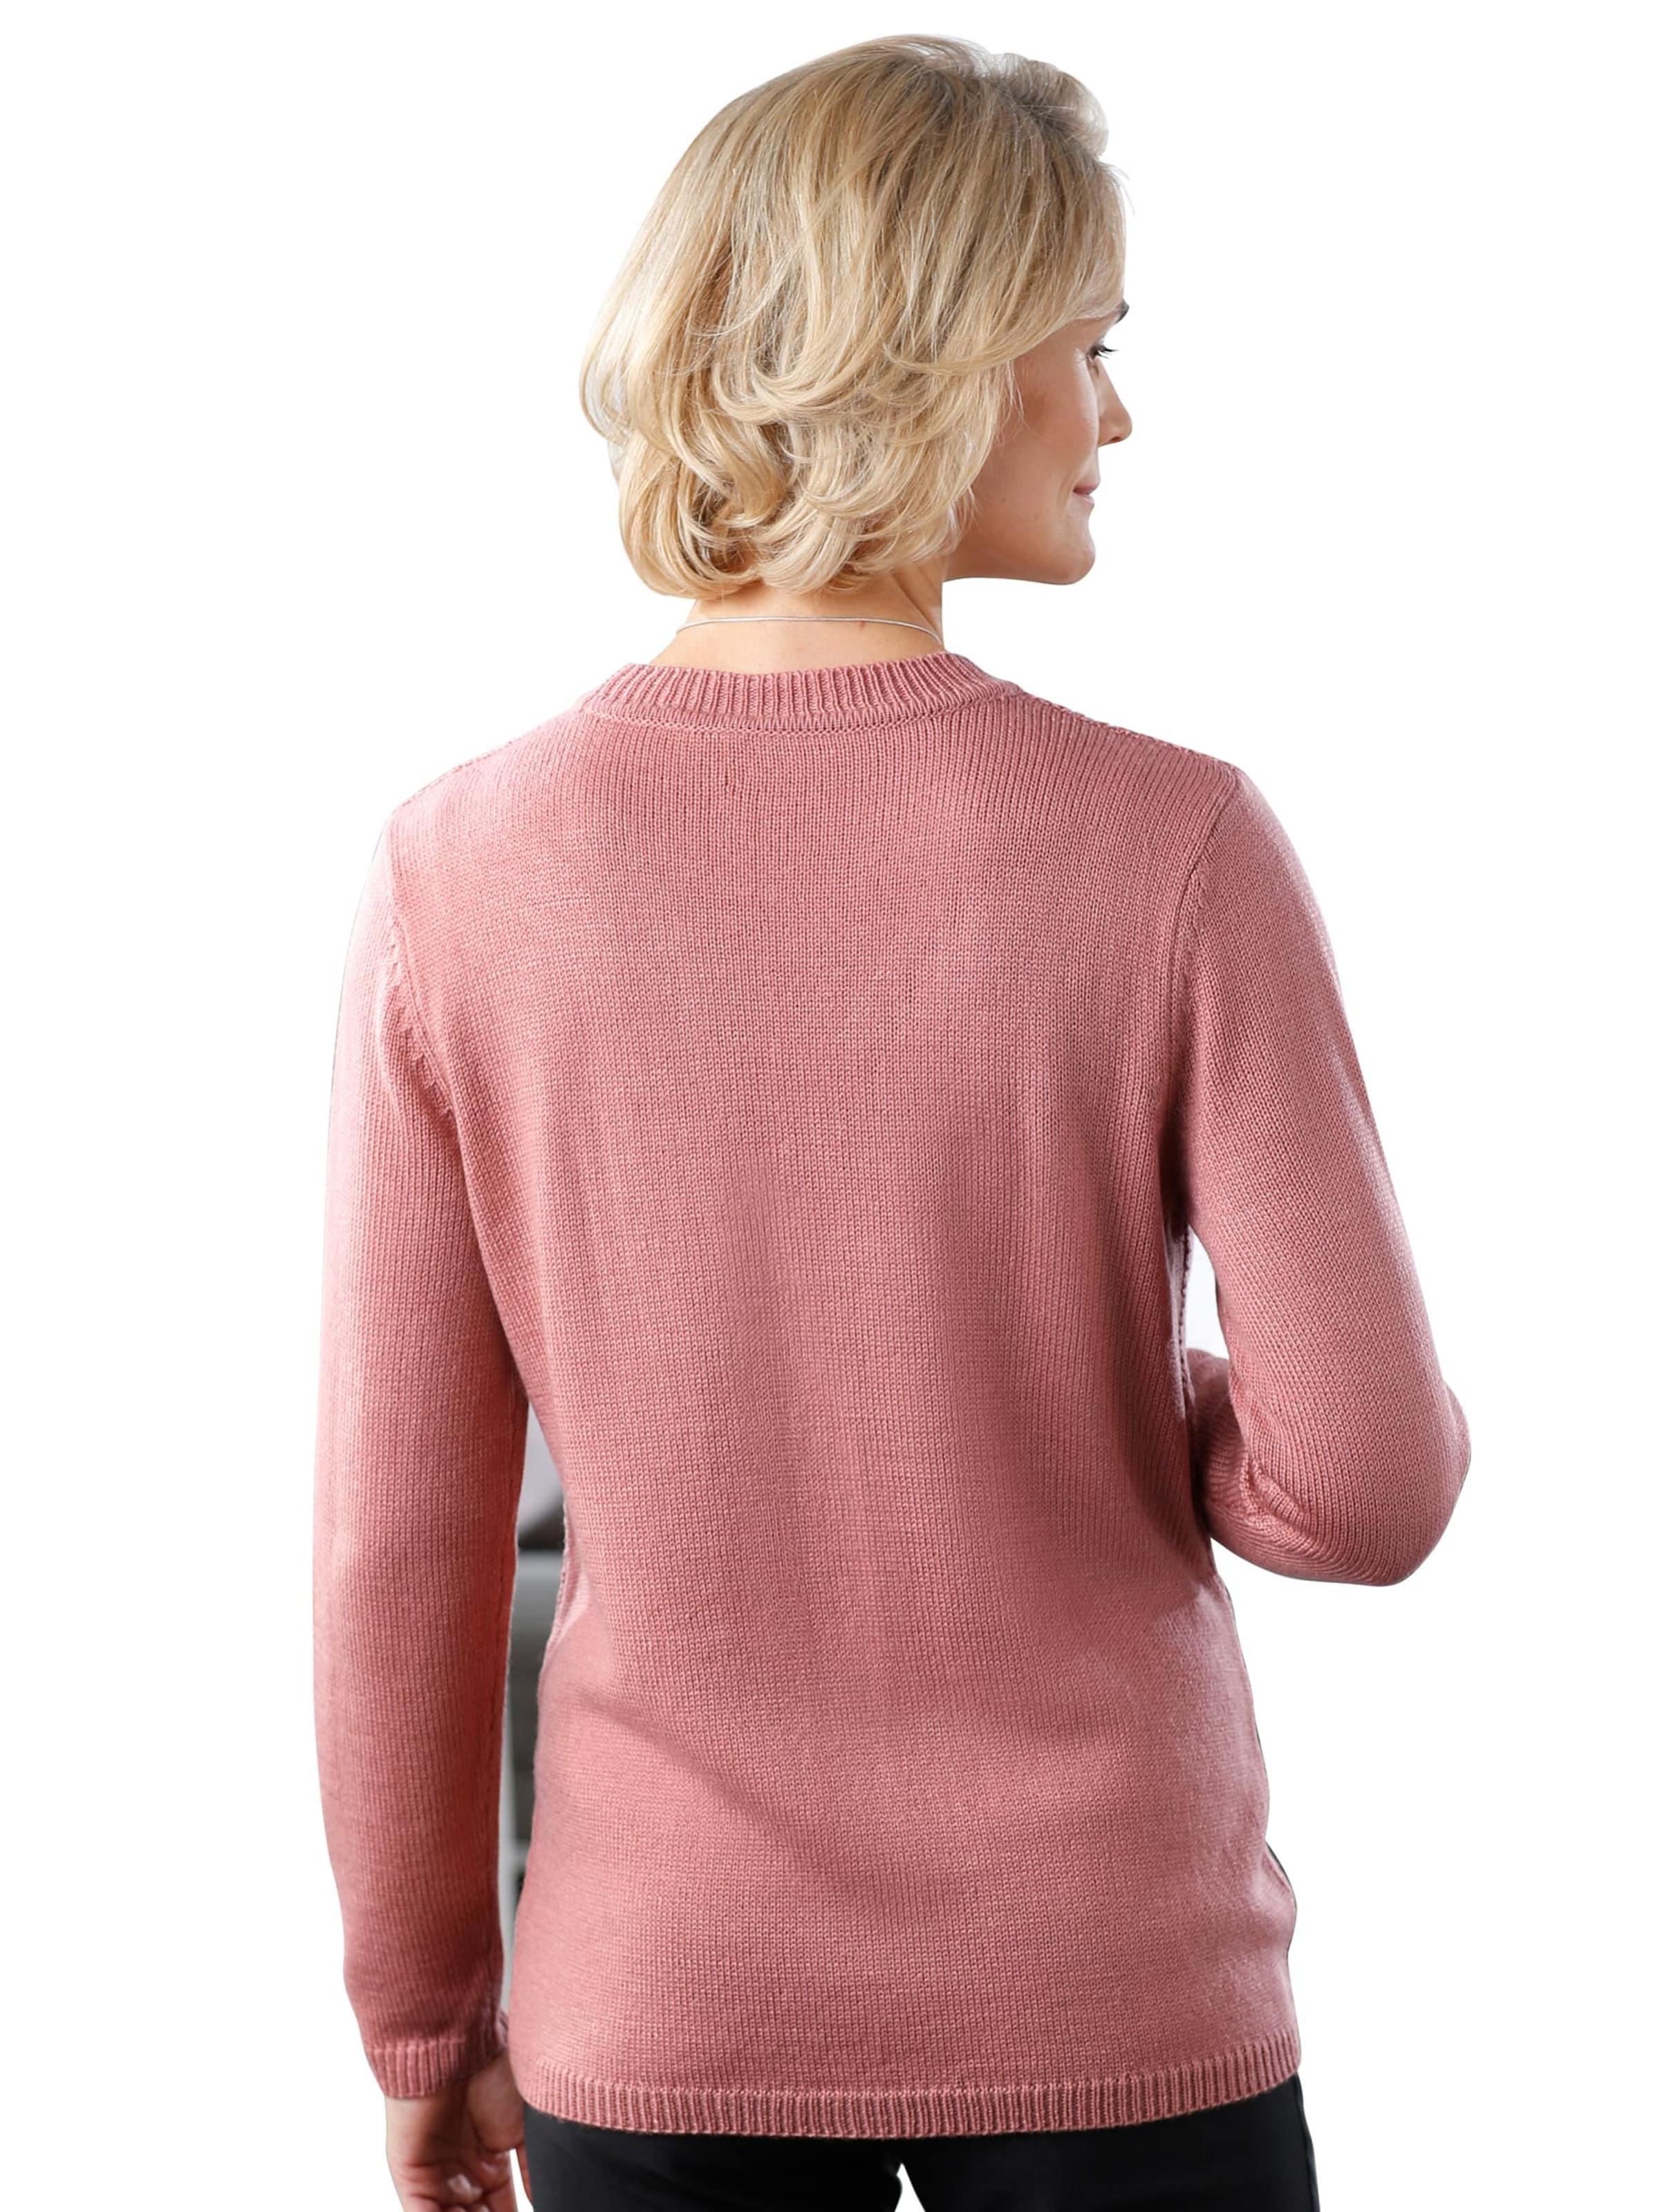 witt weiden -  Damen Pullover rosenholz